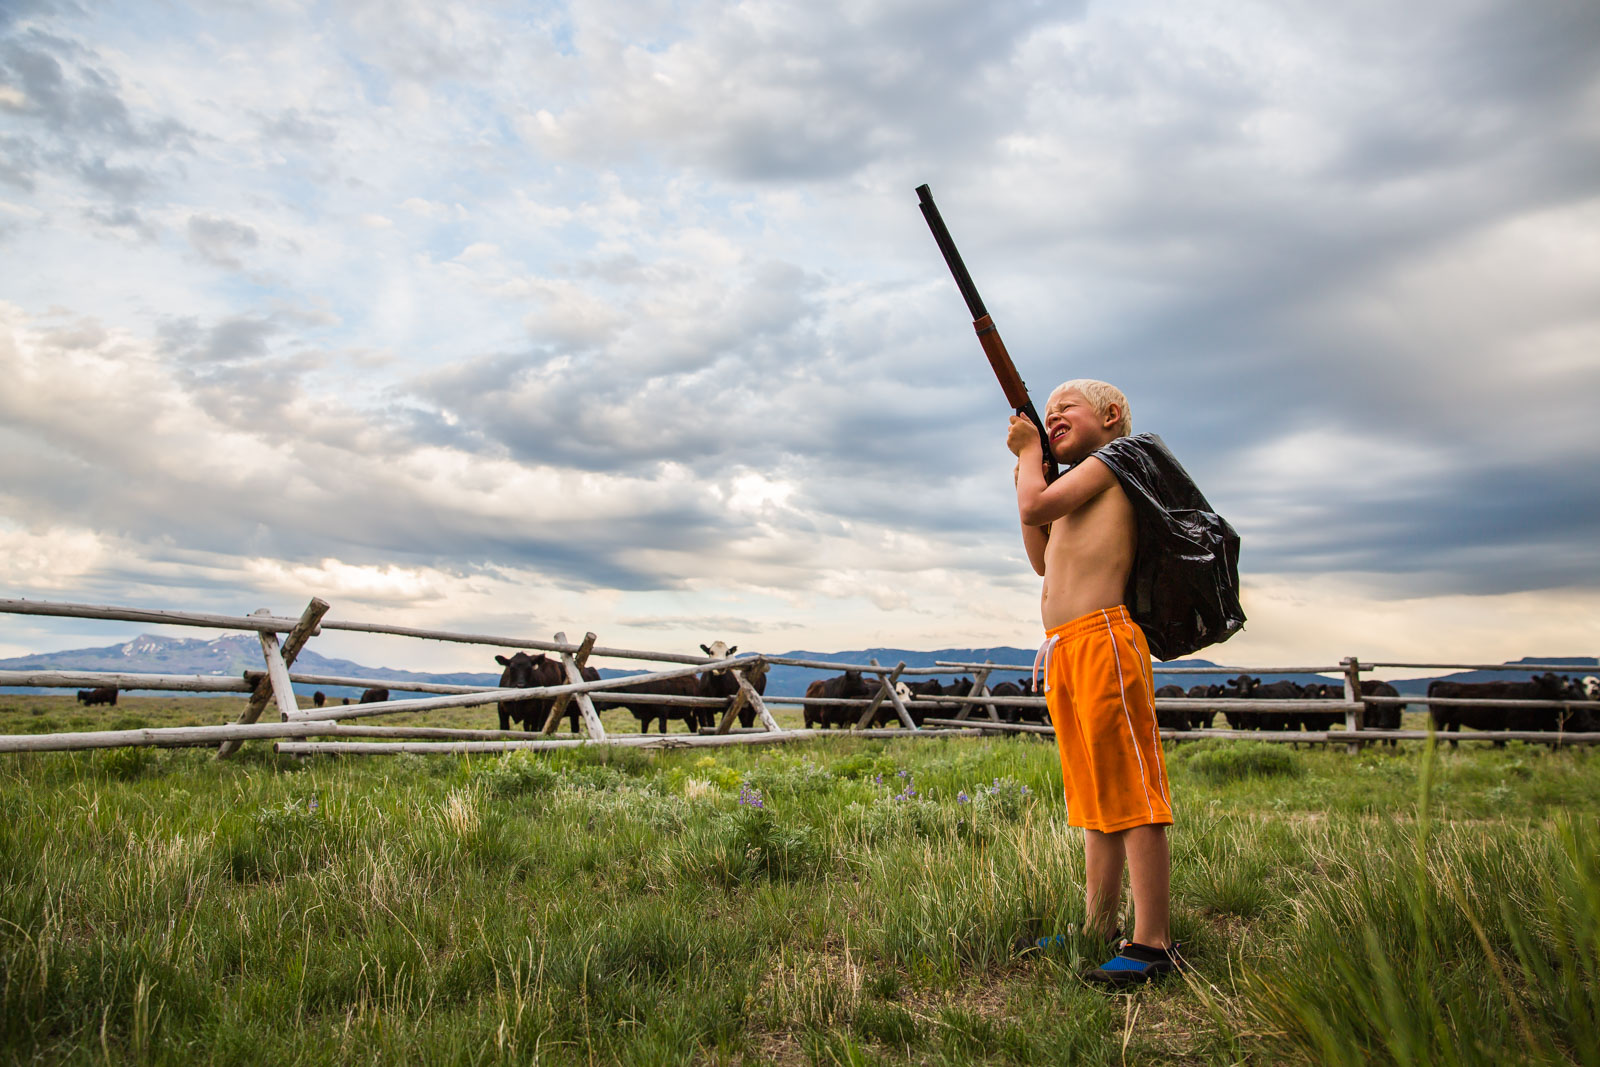 child-portrait-montana-gun-cows